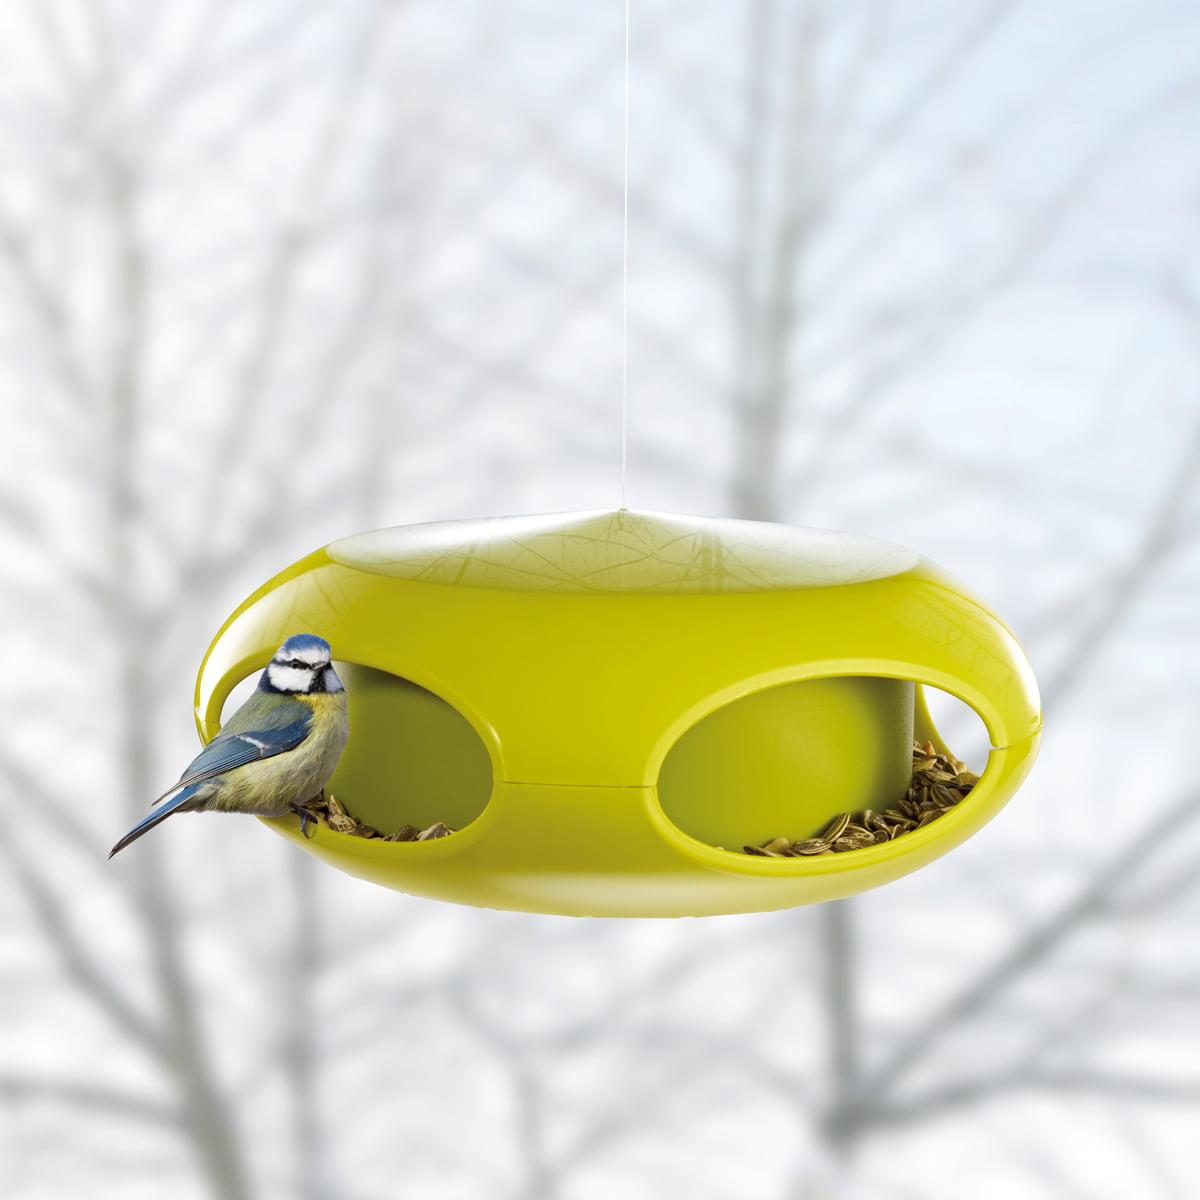 upside tube finch pet down feeder wild yellow bird house perky